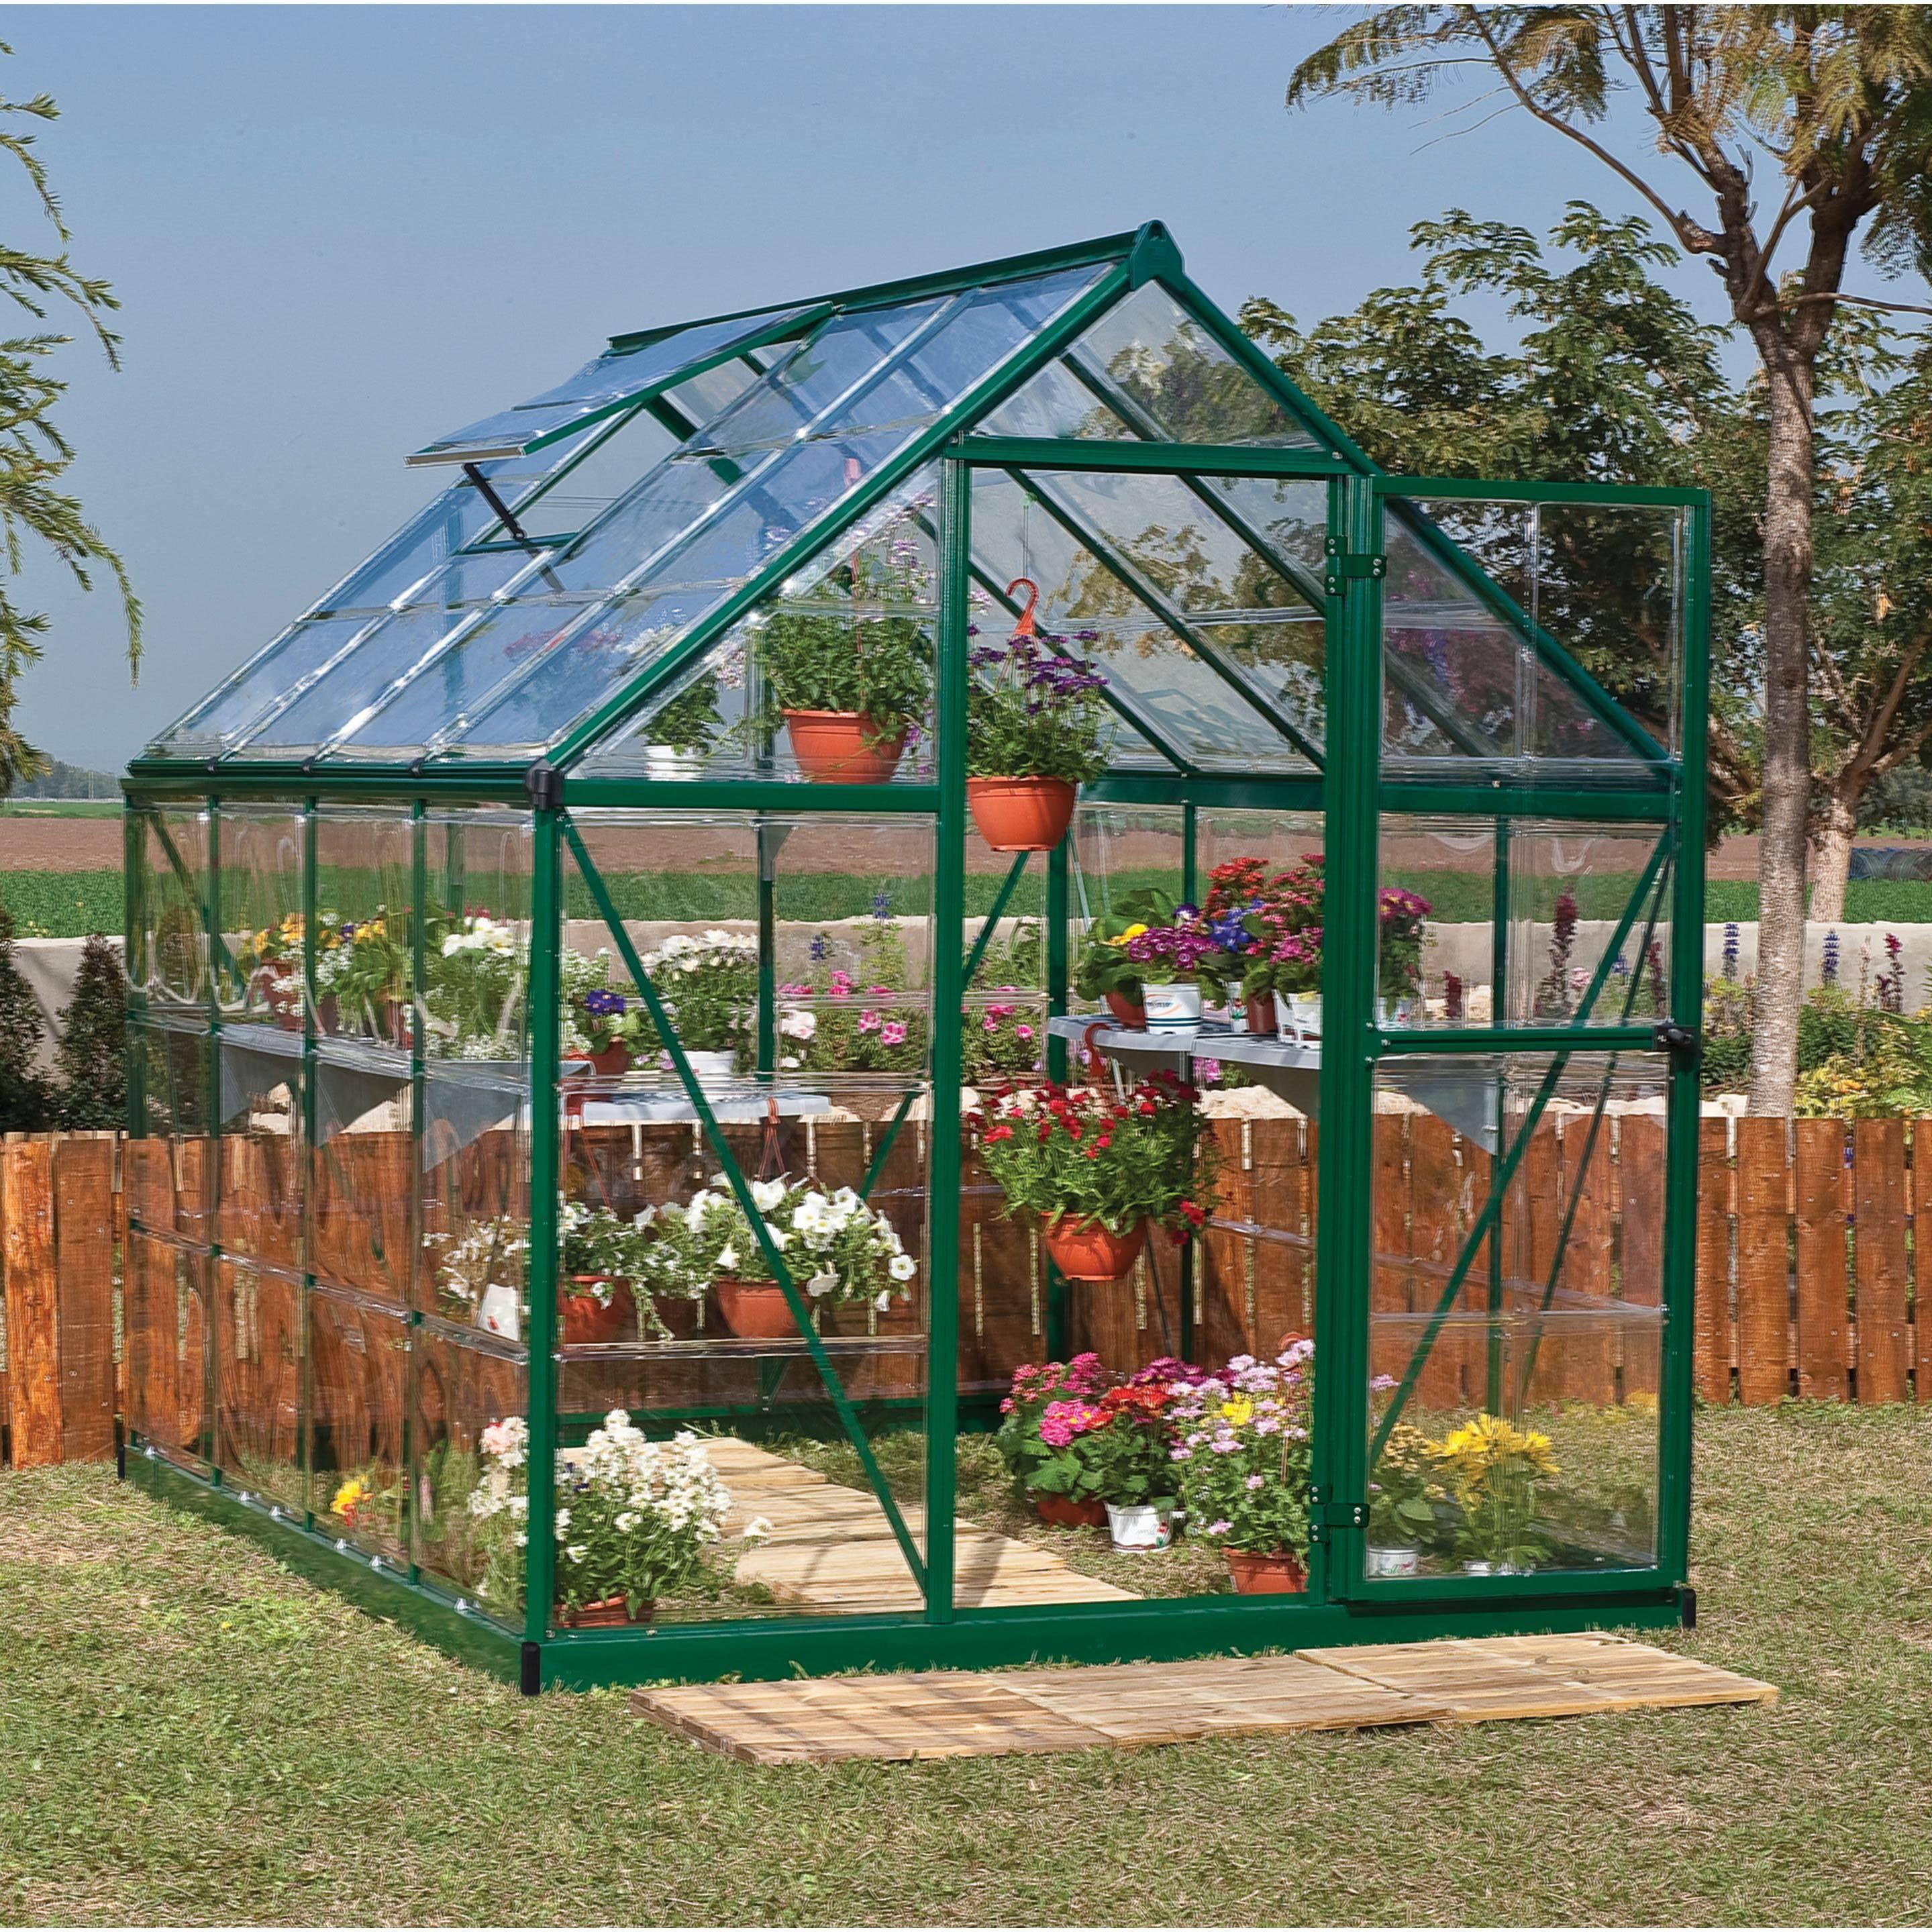 Serre De Jardin Verte Harmony 4 5 M Aluminium Et Polycarbonate Palram En 2020 Serre Arriere Cour Serre Polycarbonate Et Plans De Serre